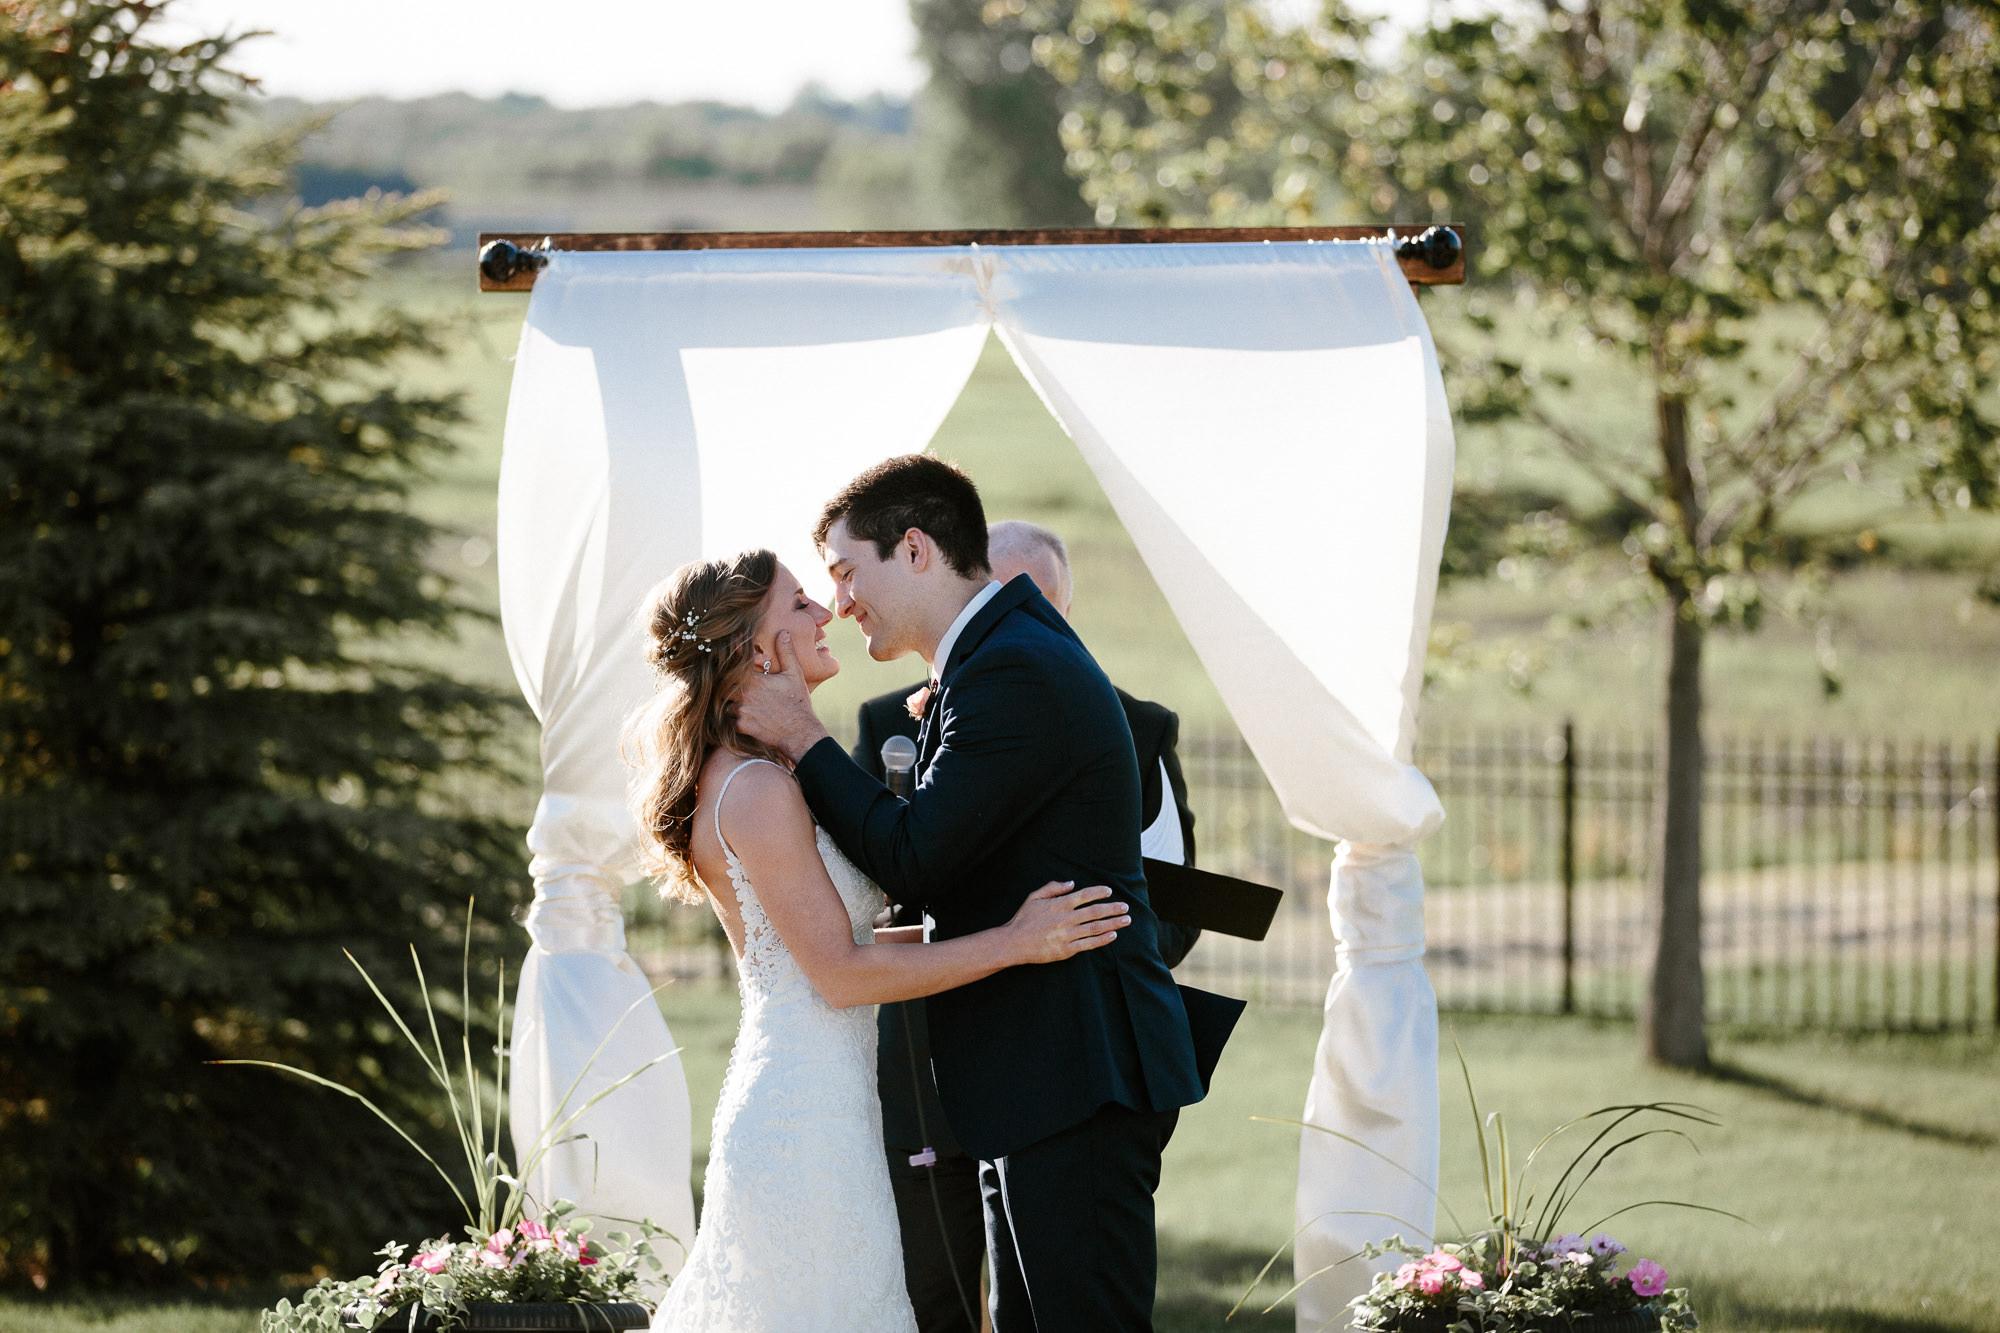 wedding-elopement-adventerous-romantic-timeless-south-dakota-blue-haven-barn-052.jpg